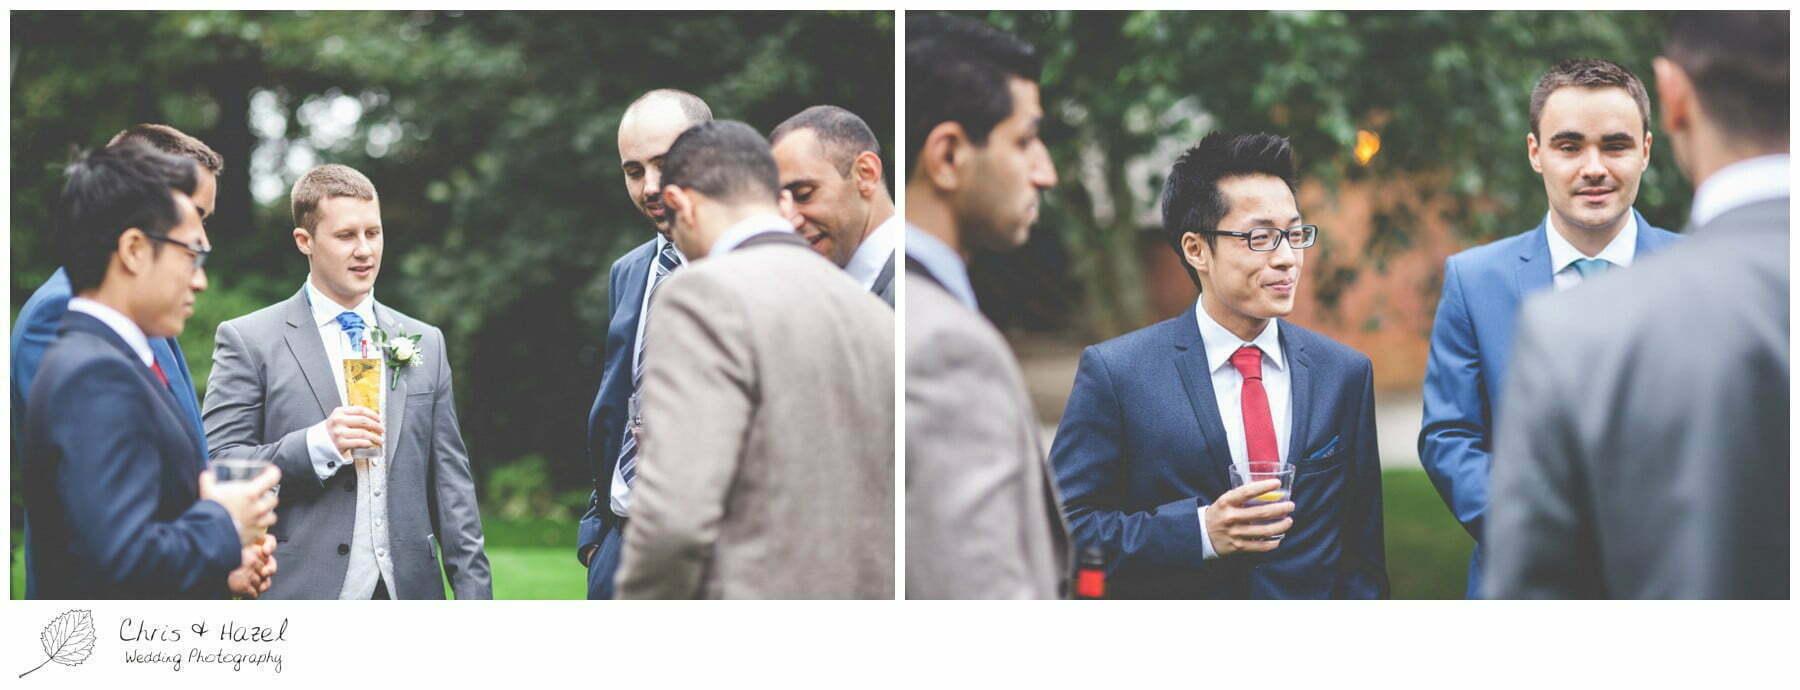 wedding guests bartle hall, documentary wedding photography, Preston Wedding Photographer, preston, wedding, photographer, Bartle Hall Wedding Photographer, battle hall, Lancashire wedding photographer, Chris and Hazel Wedding Photography, Tom Goulding, Micha Waite, Micha Goulding,